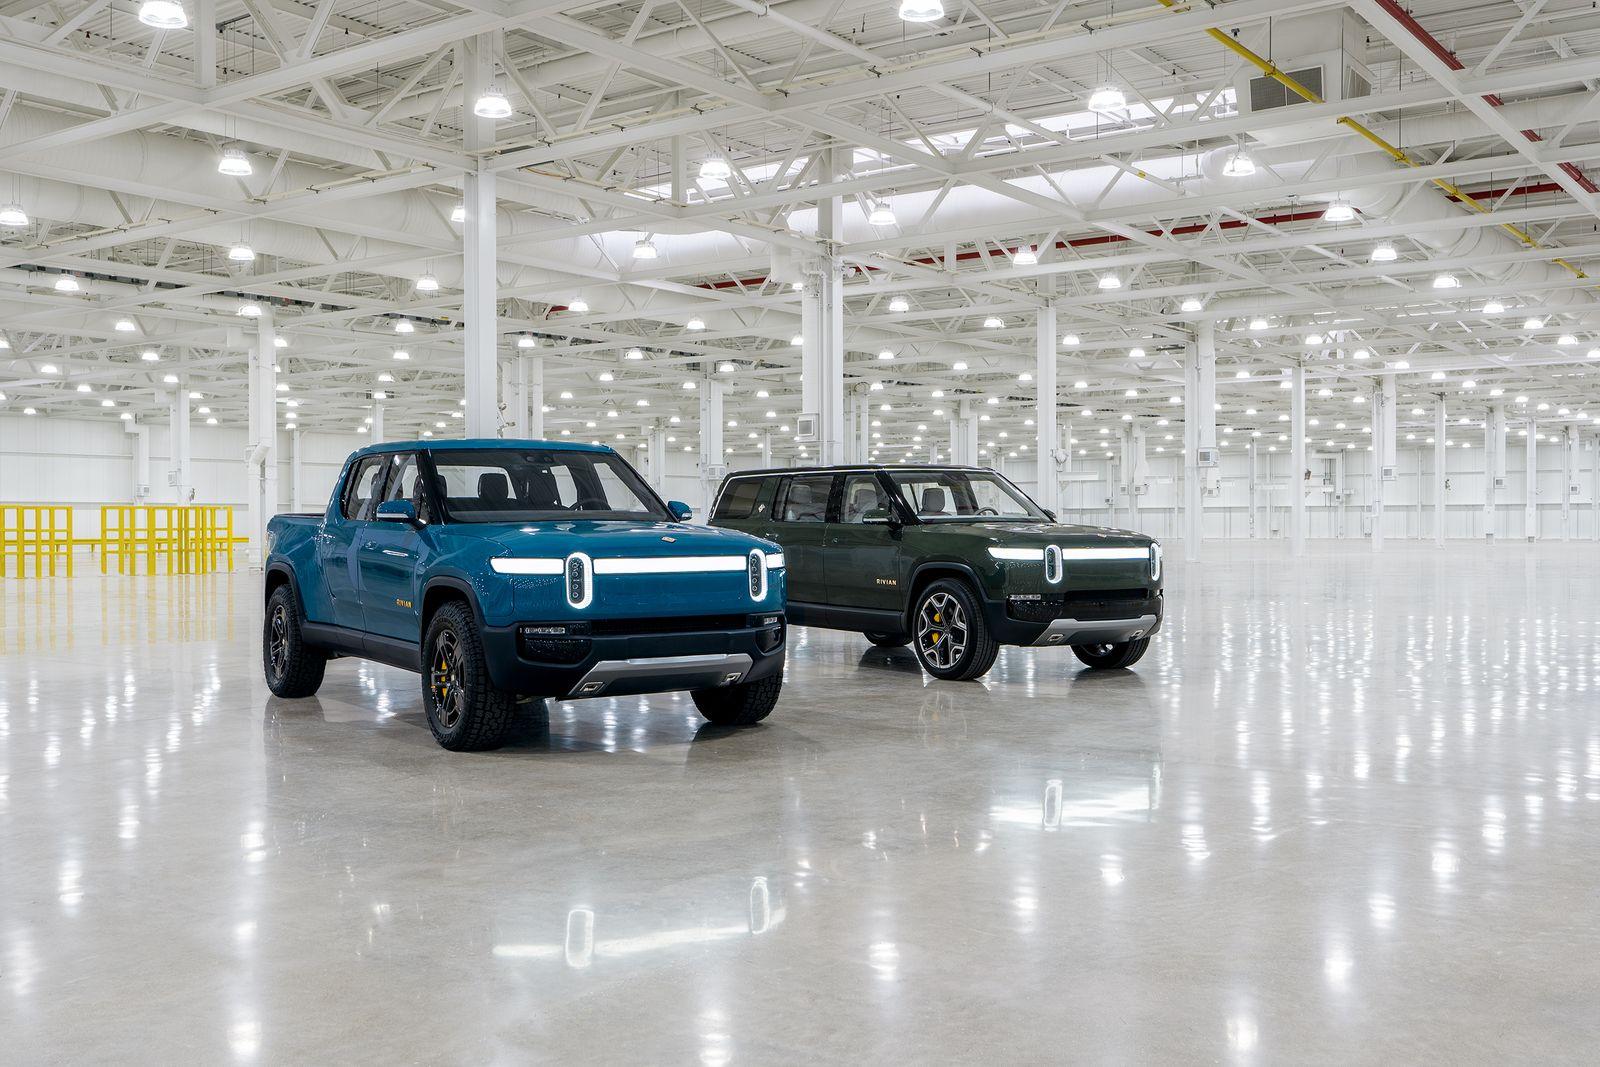 2019_11_R1T-Blue-R1S-Green-Normal-Plant-BatteryLab-LightsOn